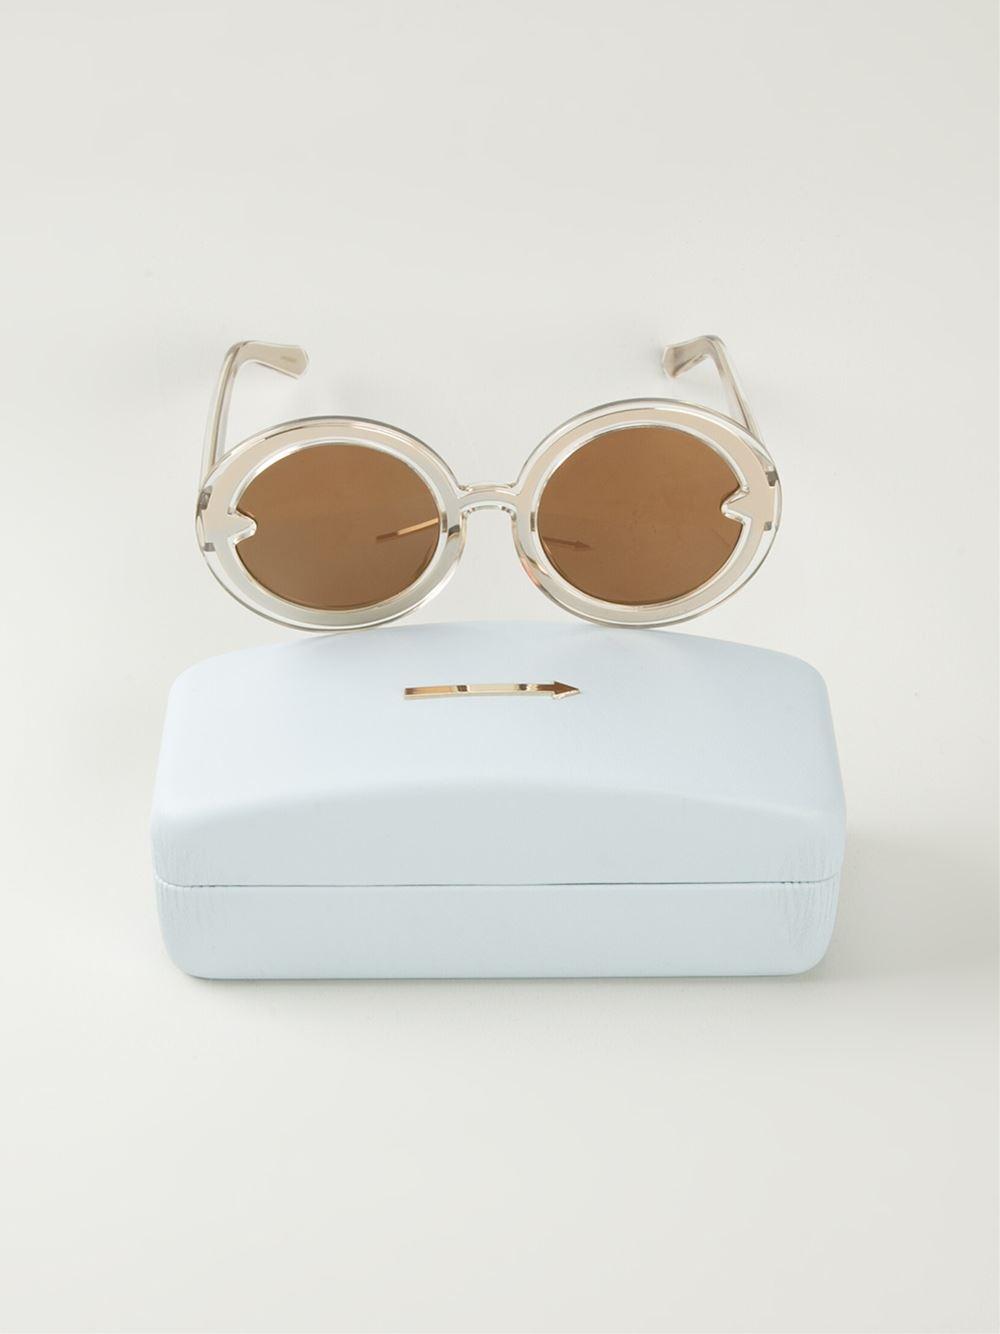 7e39d13fa5 Karen Walker Eyewear Limited Edition  orbit  Sunglasses - Elite ...